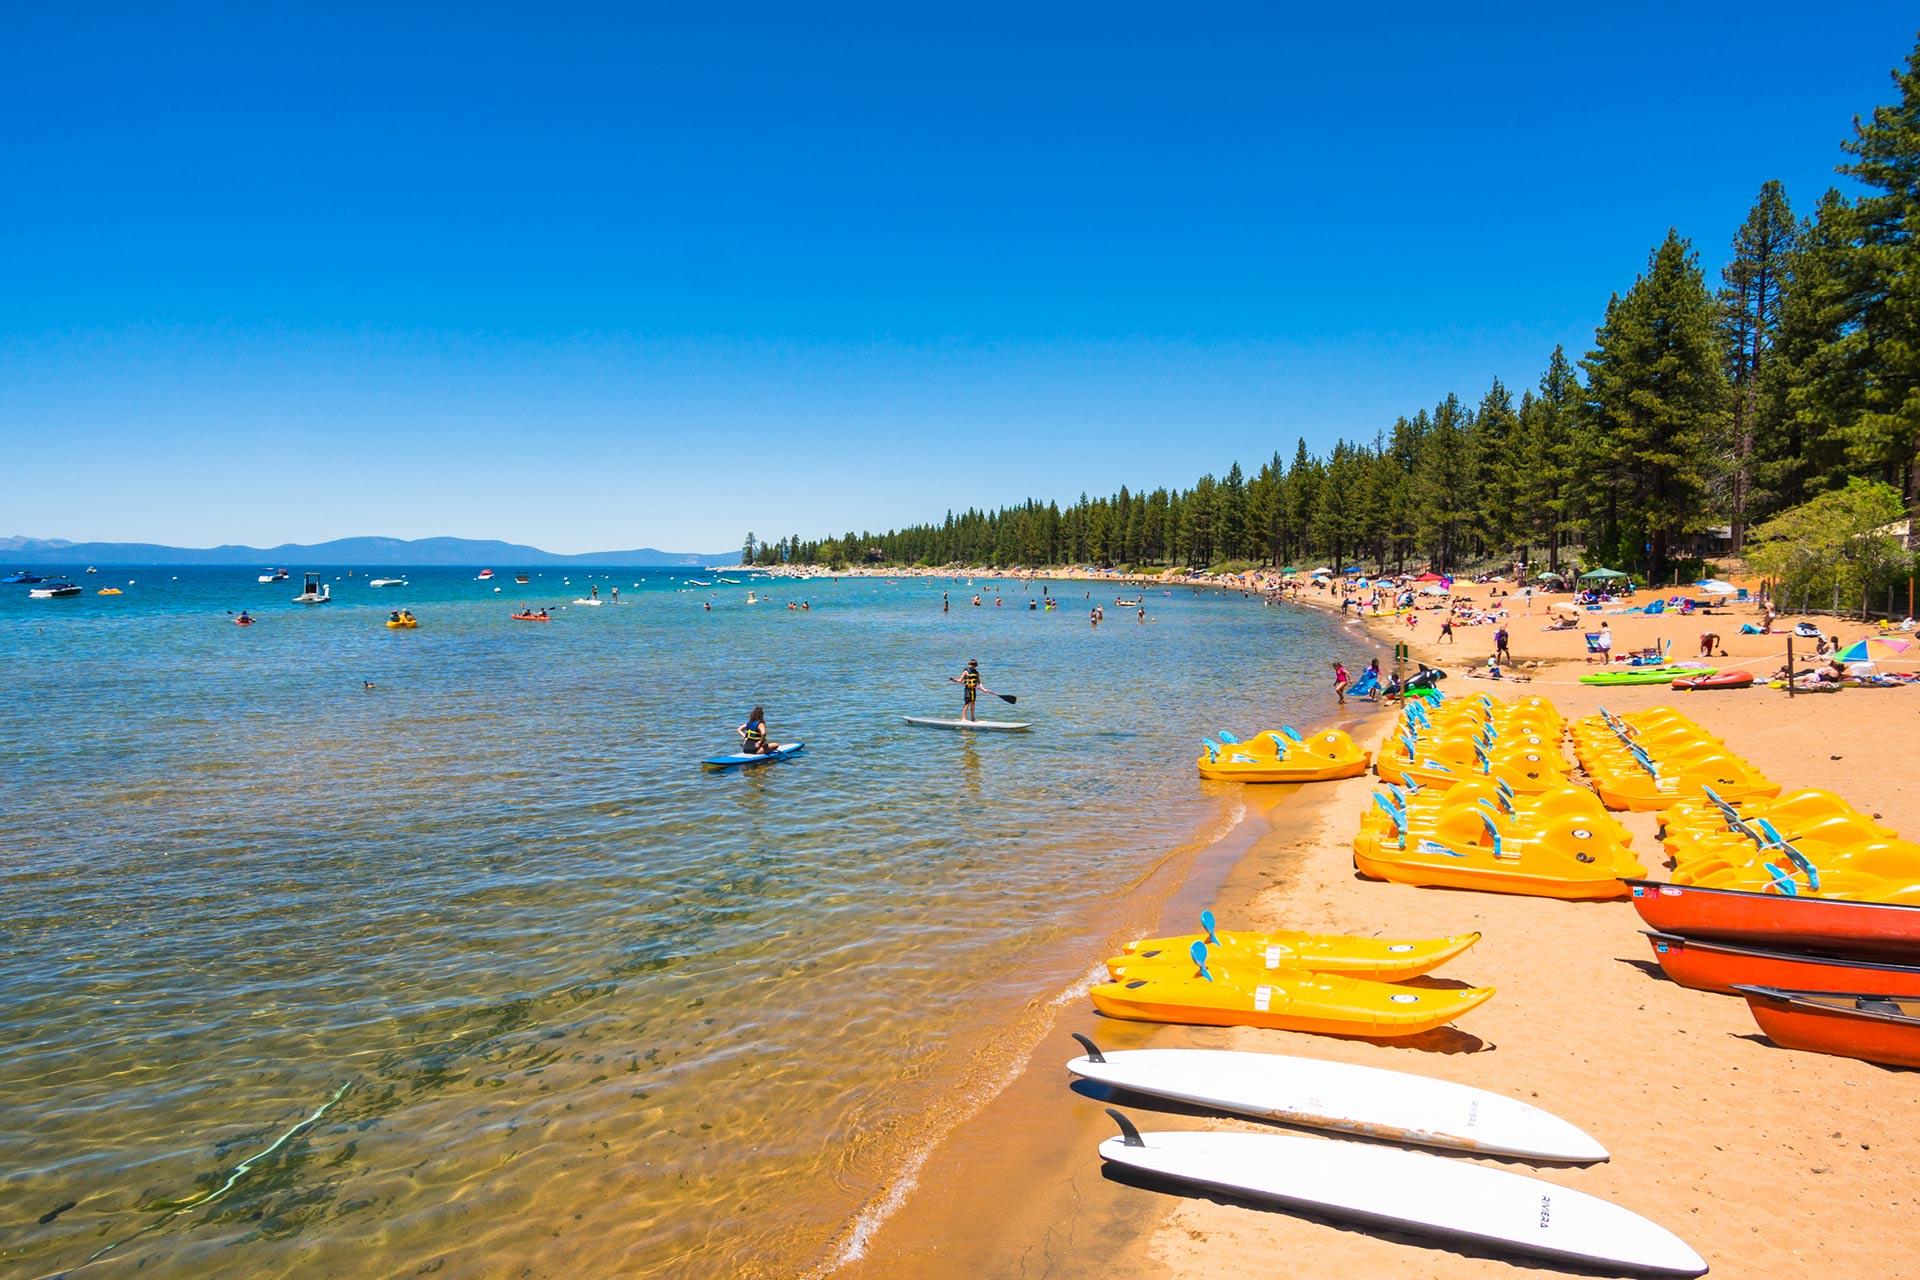 A very family-friendly beach in Lake Tahoe, California.